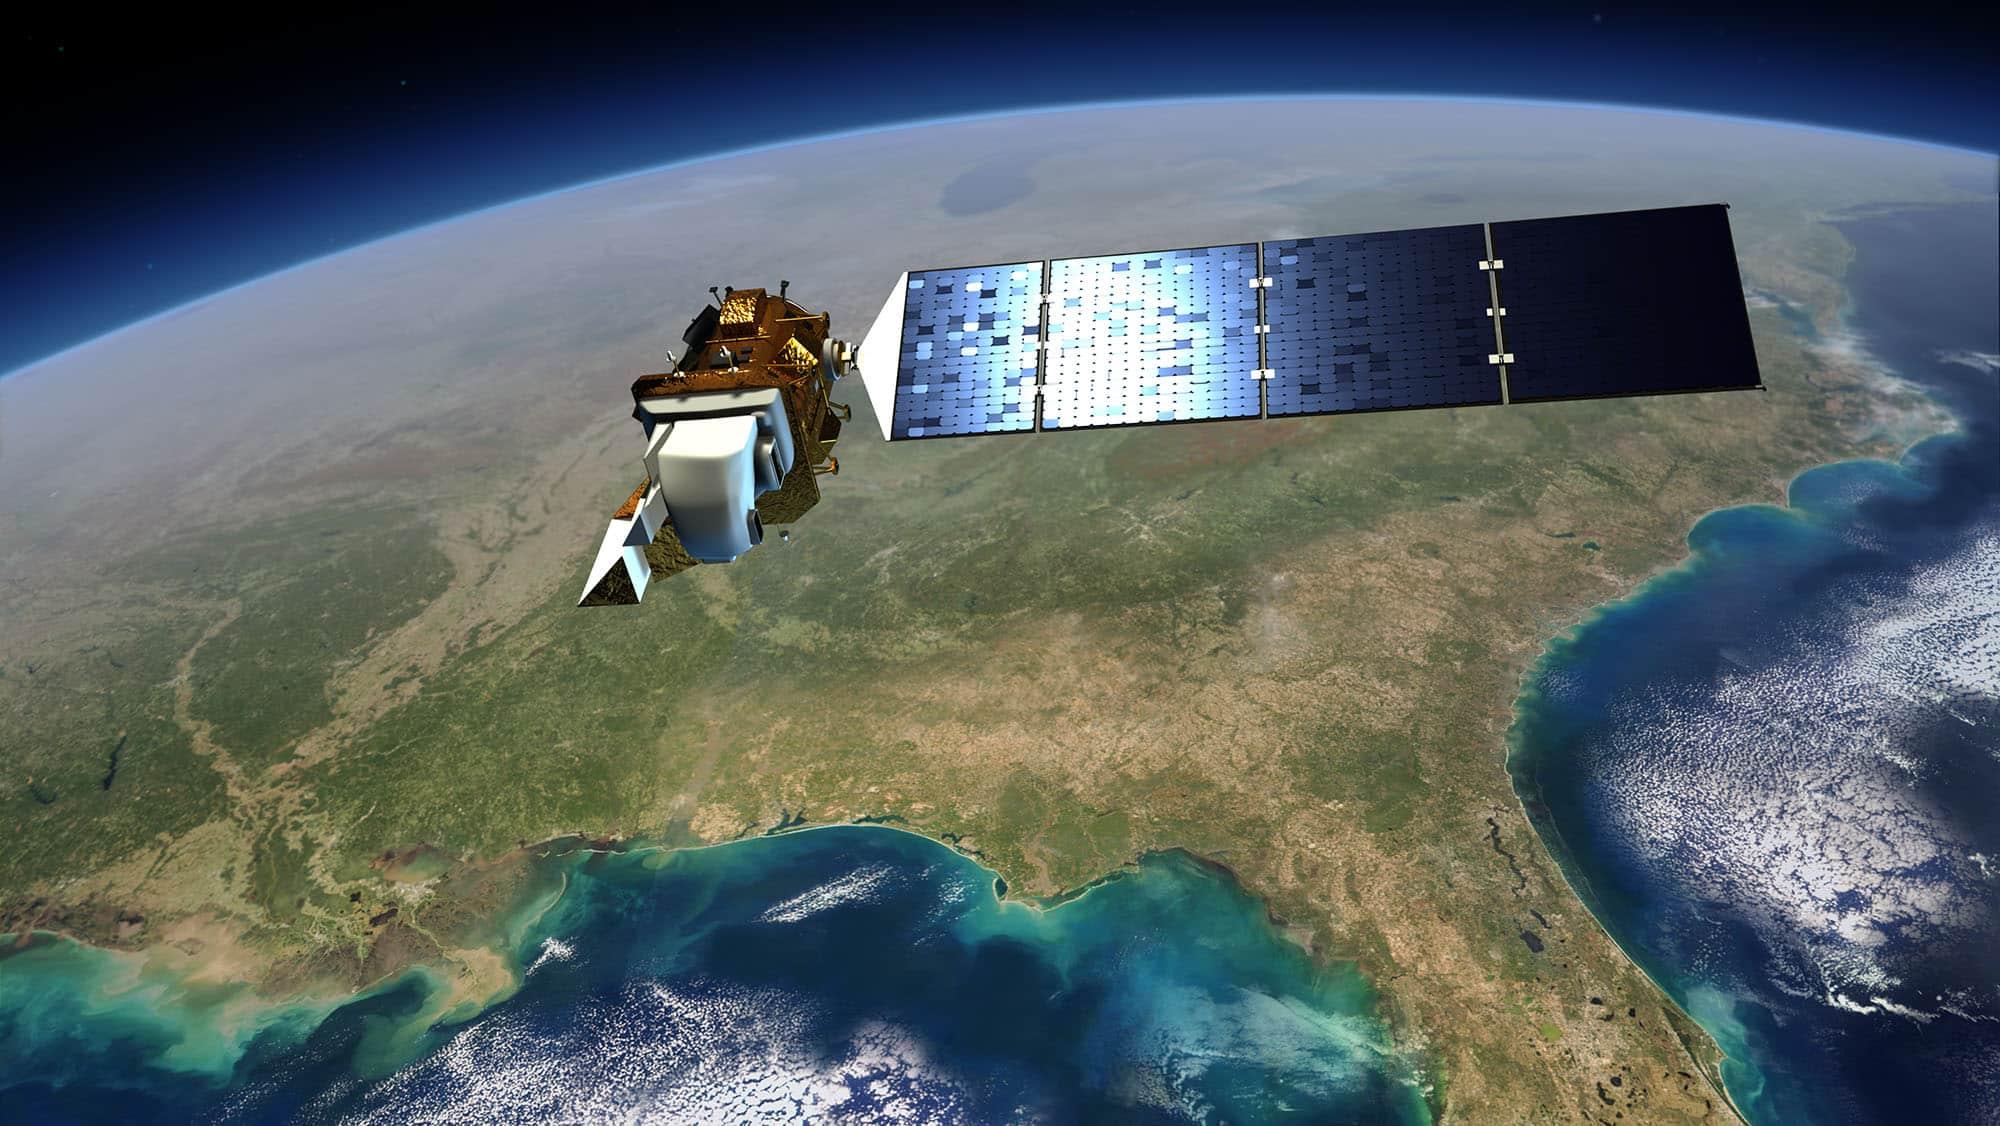 Landsat Satellite image